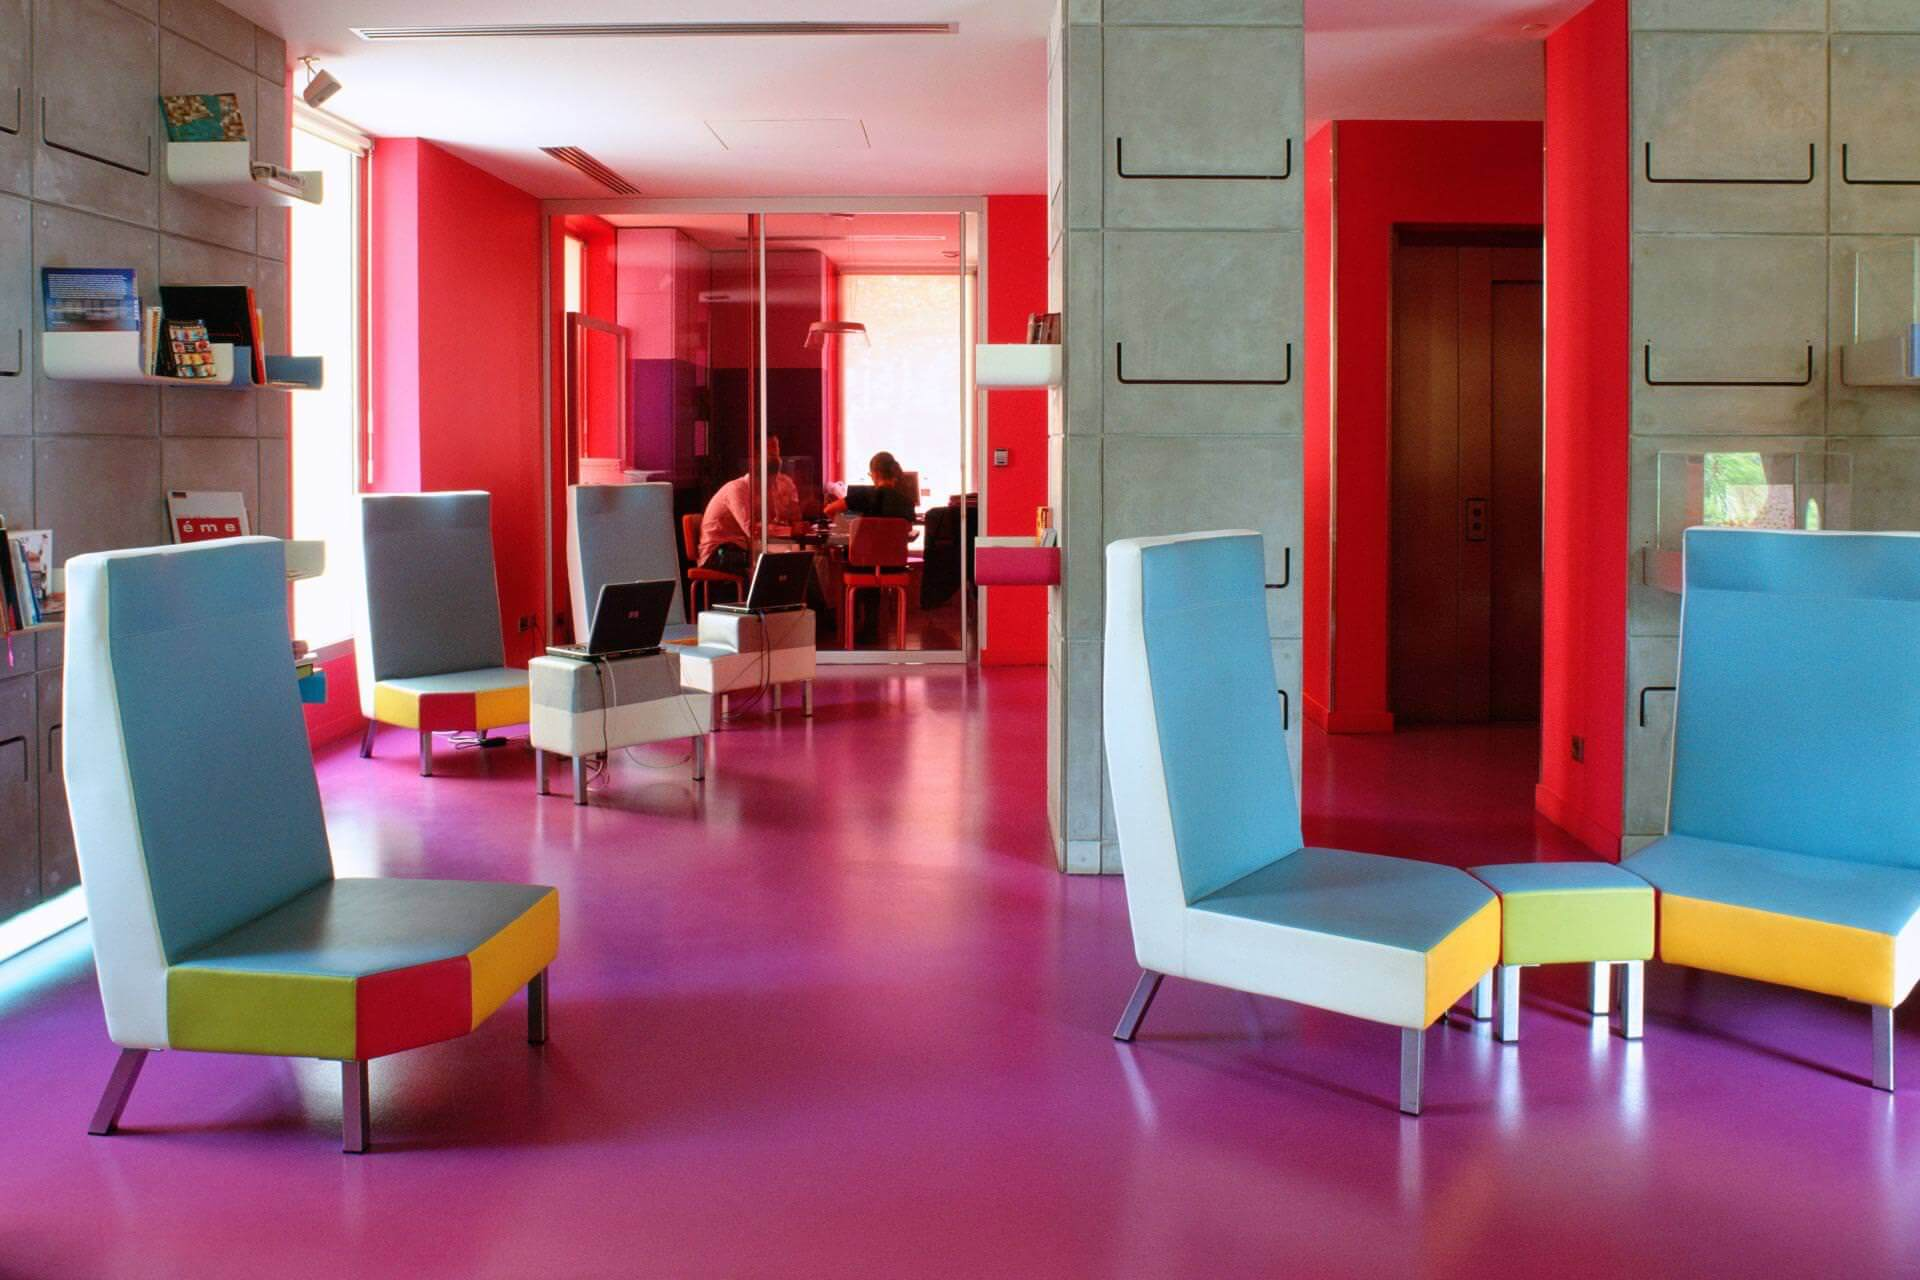 boutique-hotel-Hi-Hotel-Eco-Spa-Beach-Nice-Lobby-16-3-2